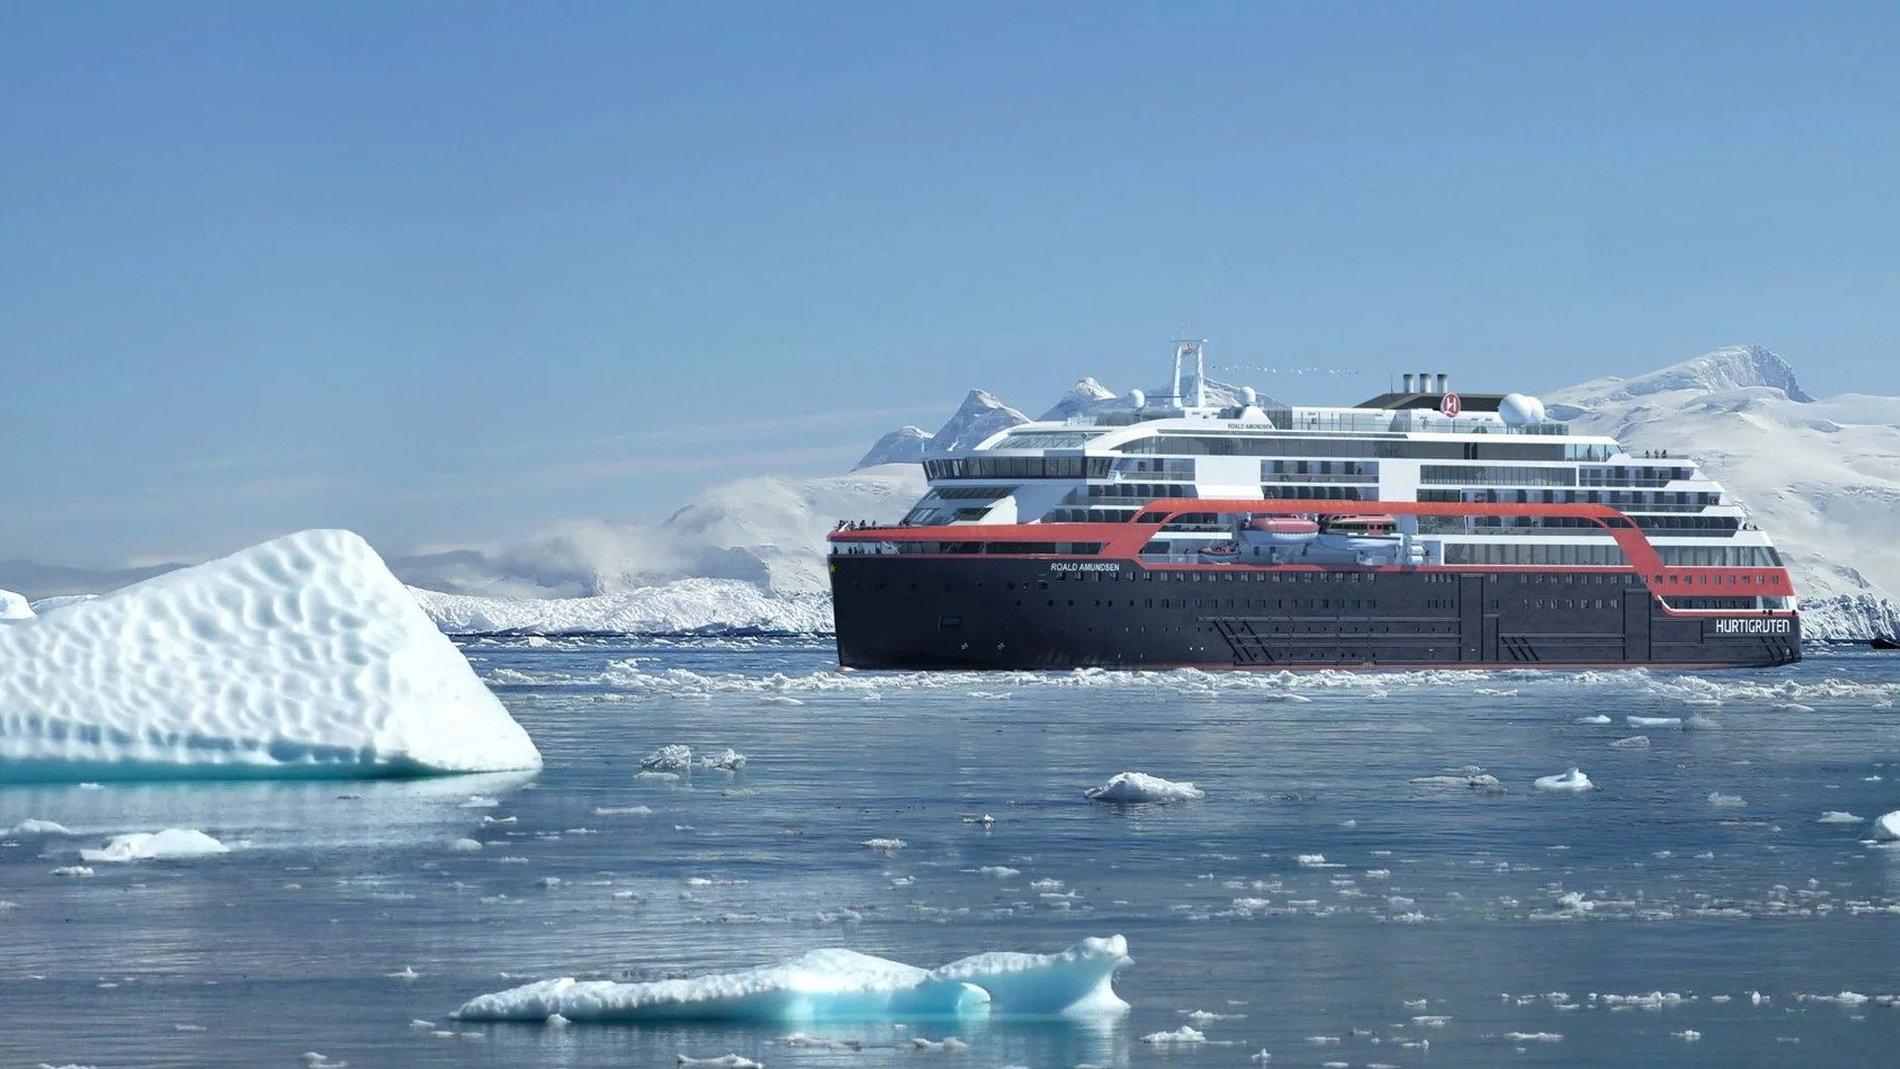 Hurtigruten MS Roald Amundsen plug-in hybrid cruise ship